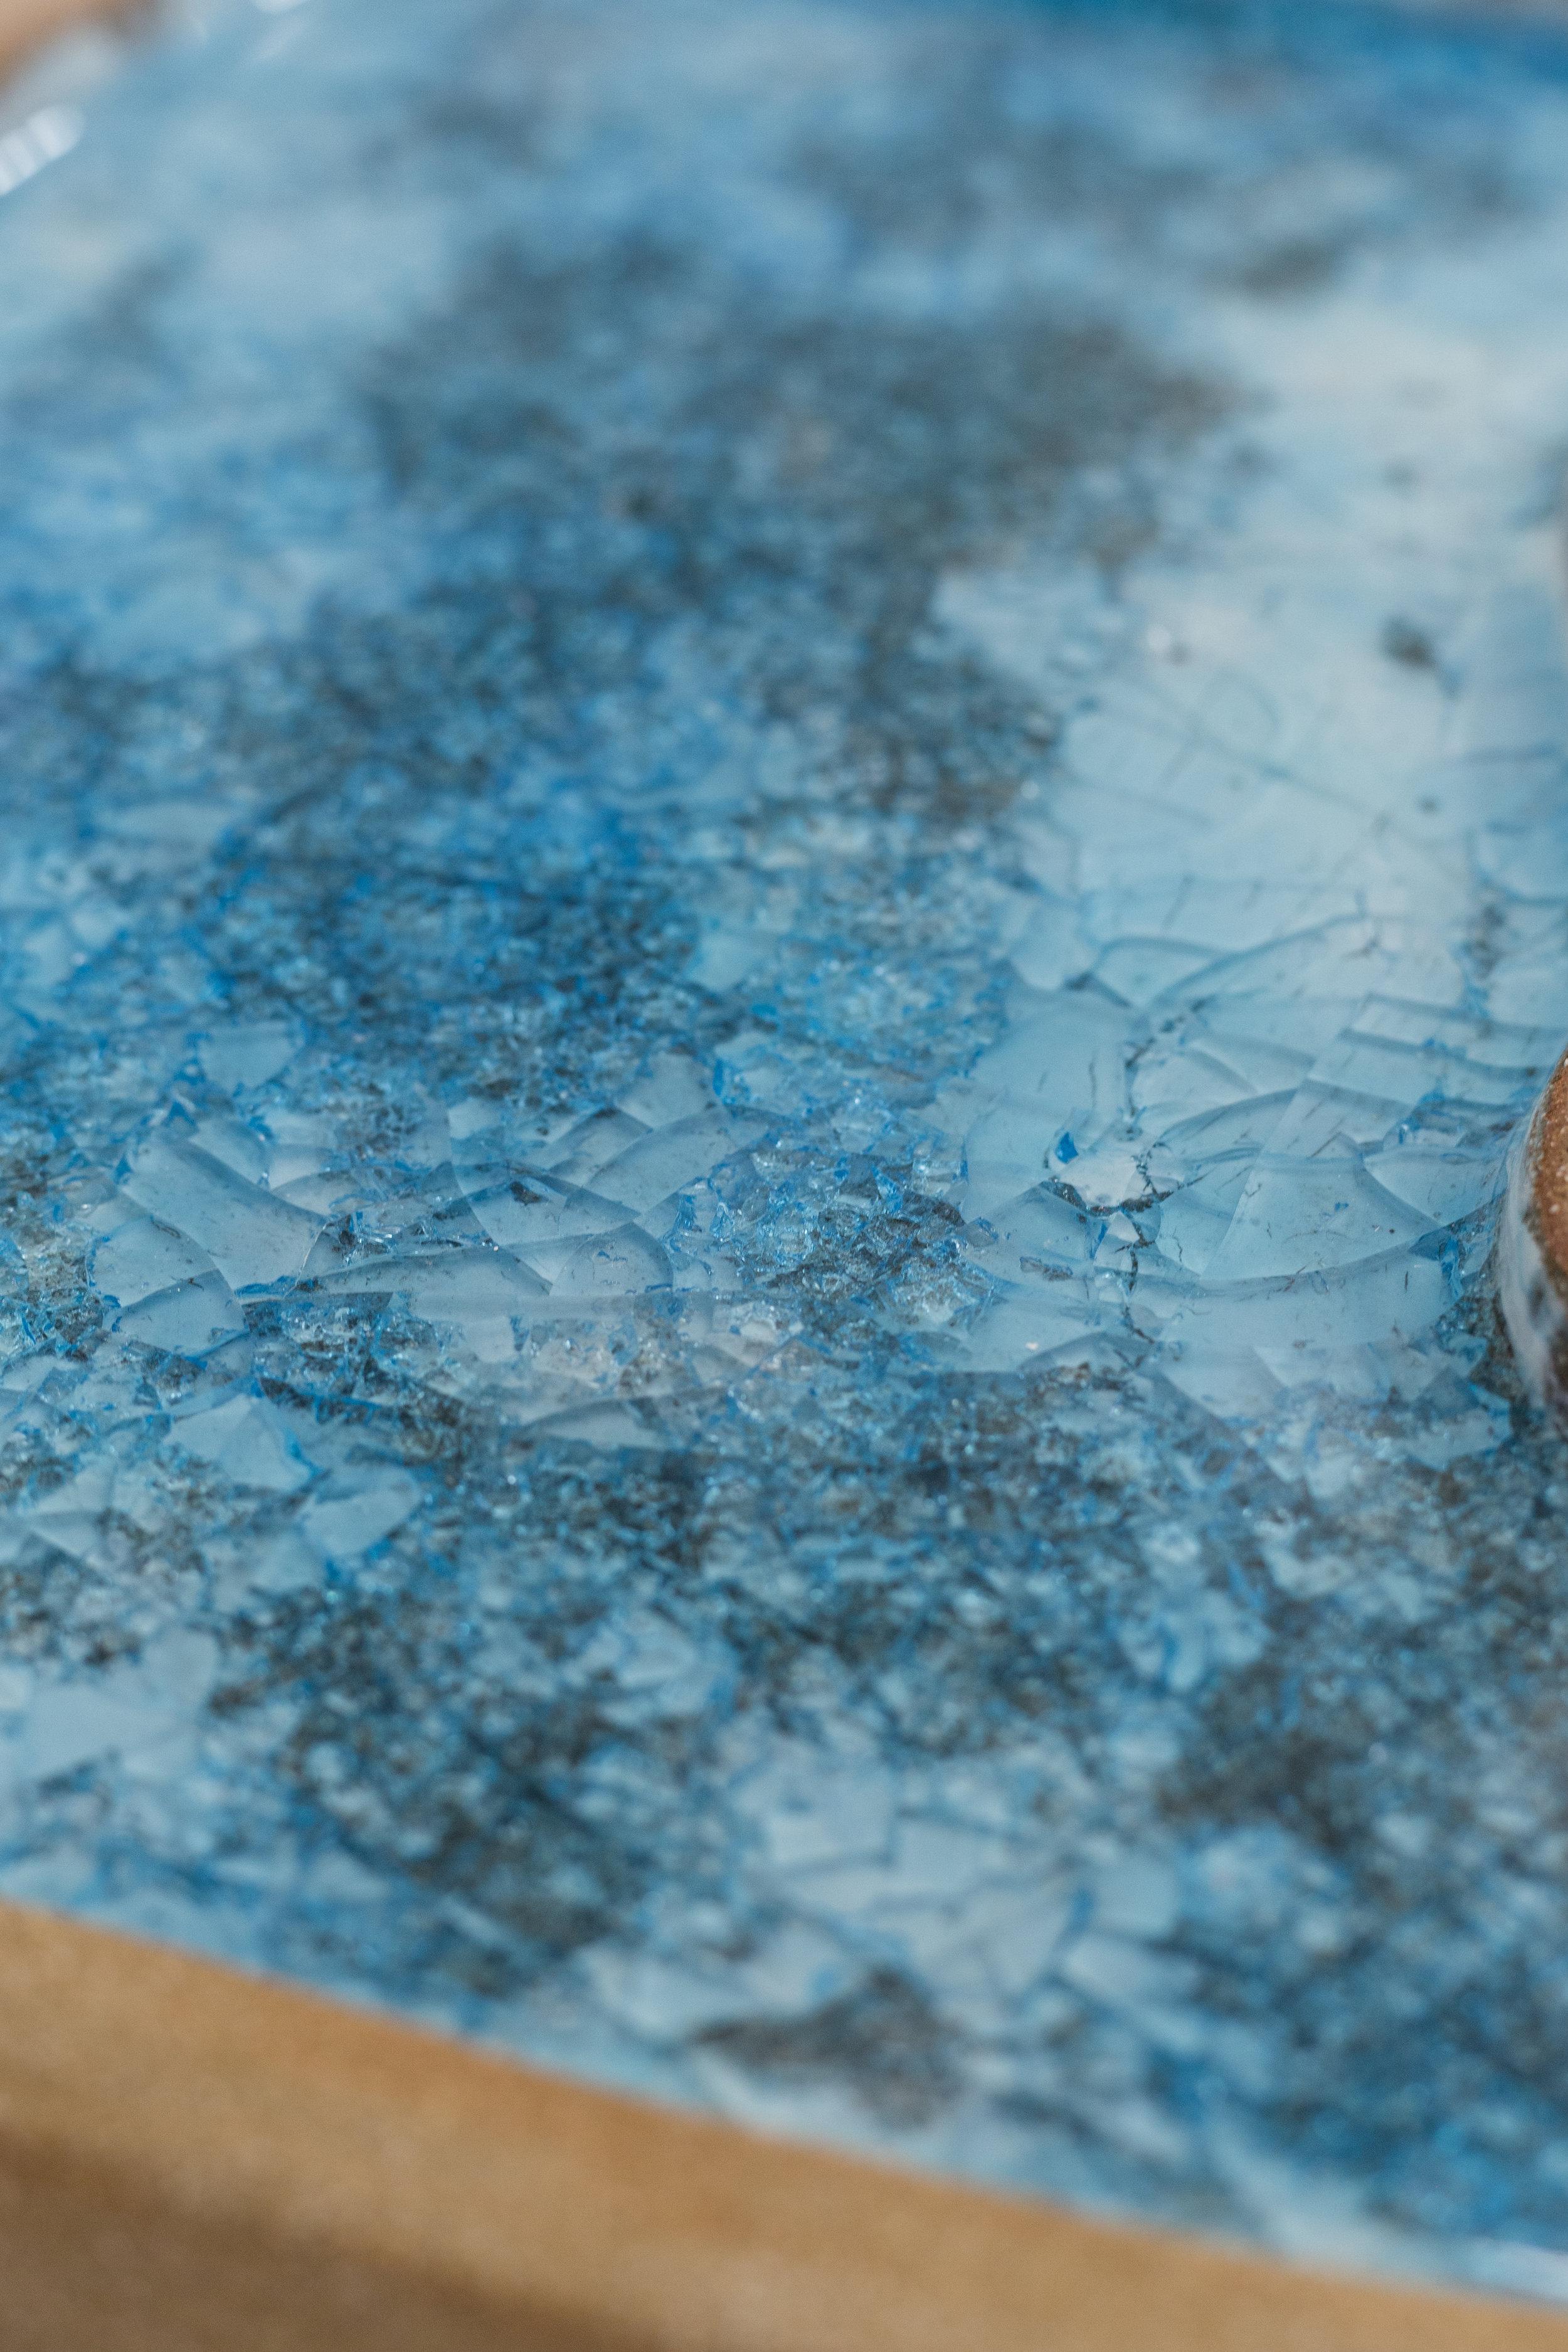 Donatella Berardi, Kitty Pool (detail), 2017, stoneware with glaze and glass, 30 x 38.5 x 3 cm Photo: Kilian Bannwart